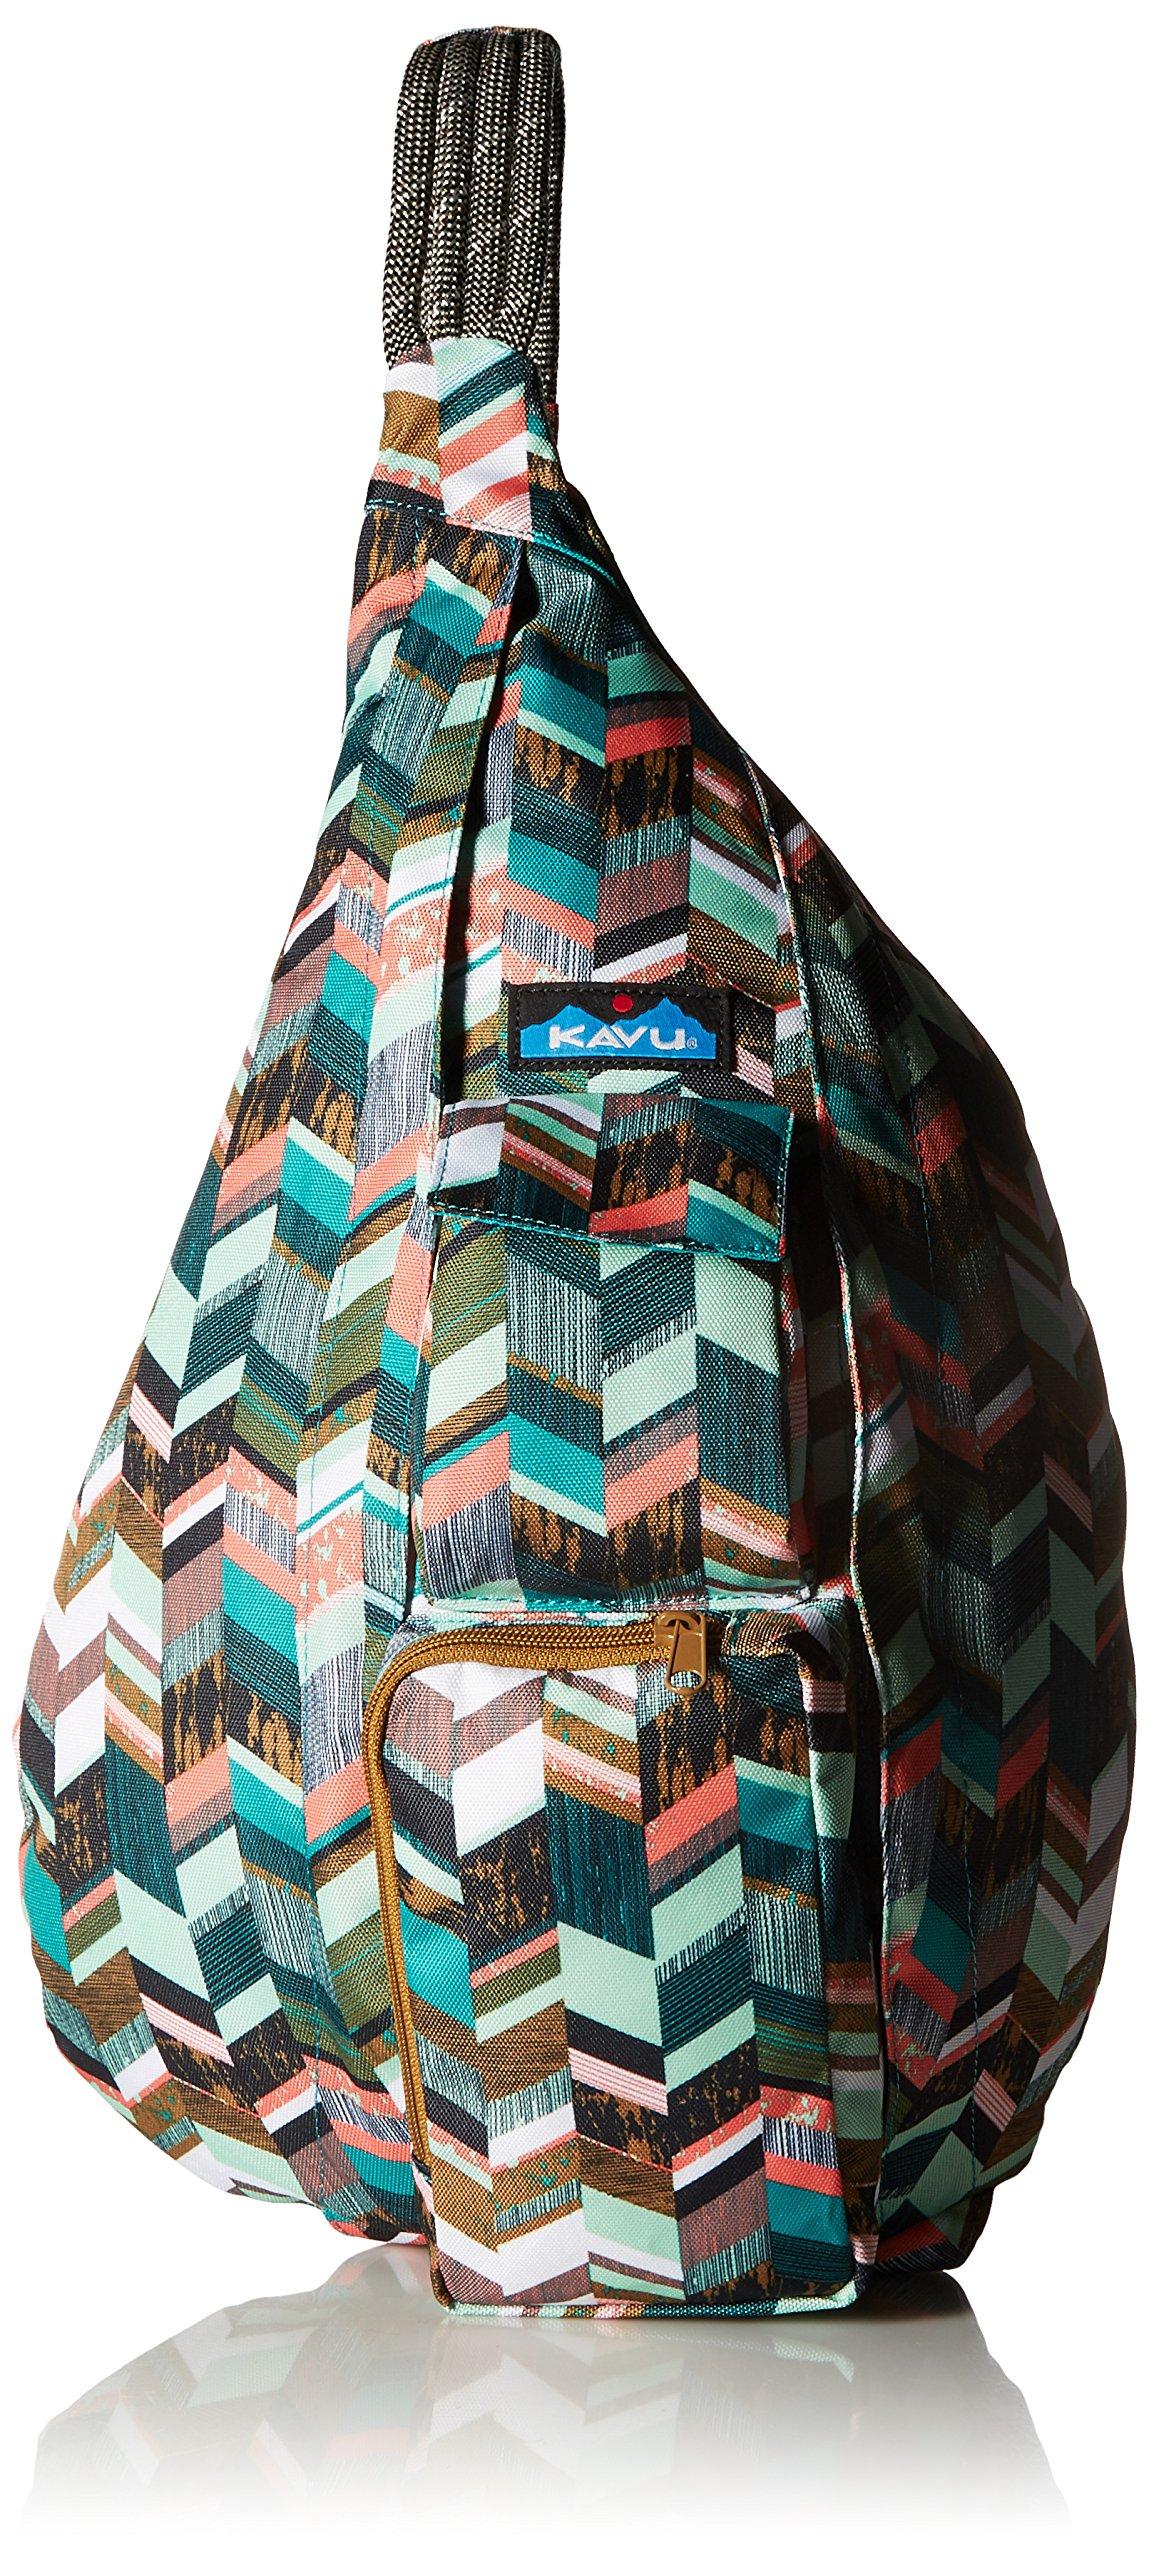 KAVU Women's Rope Sling Bag - Coastal Blocks